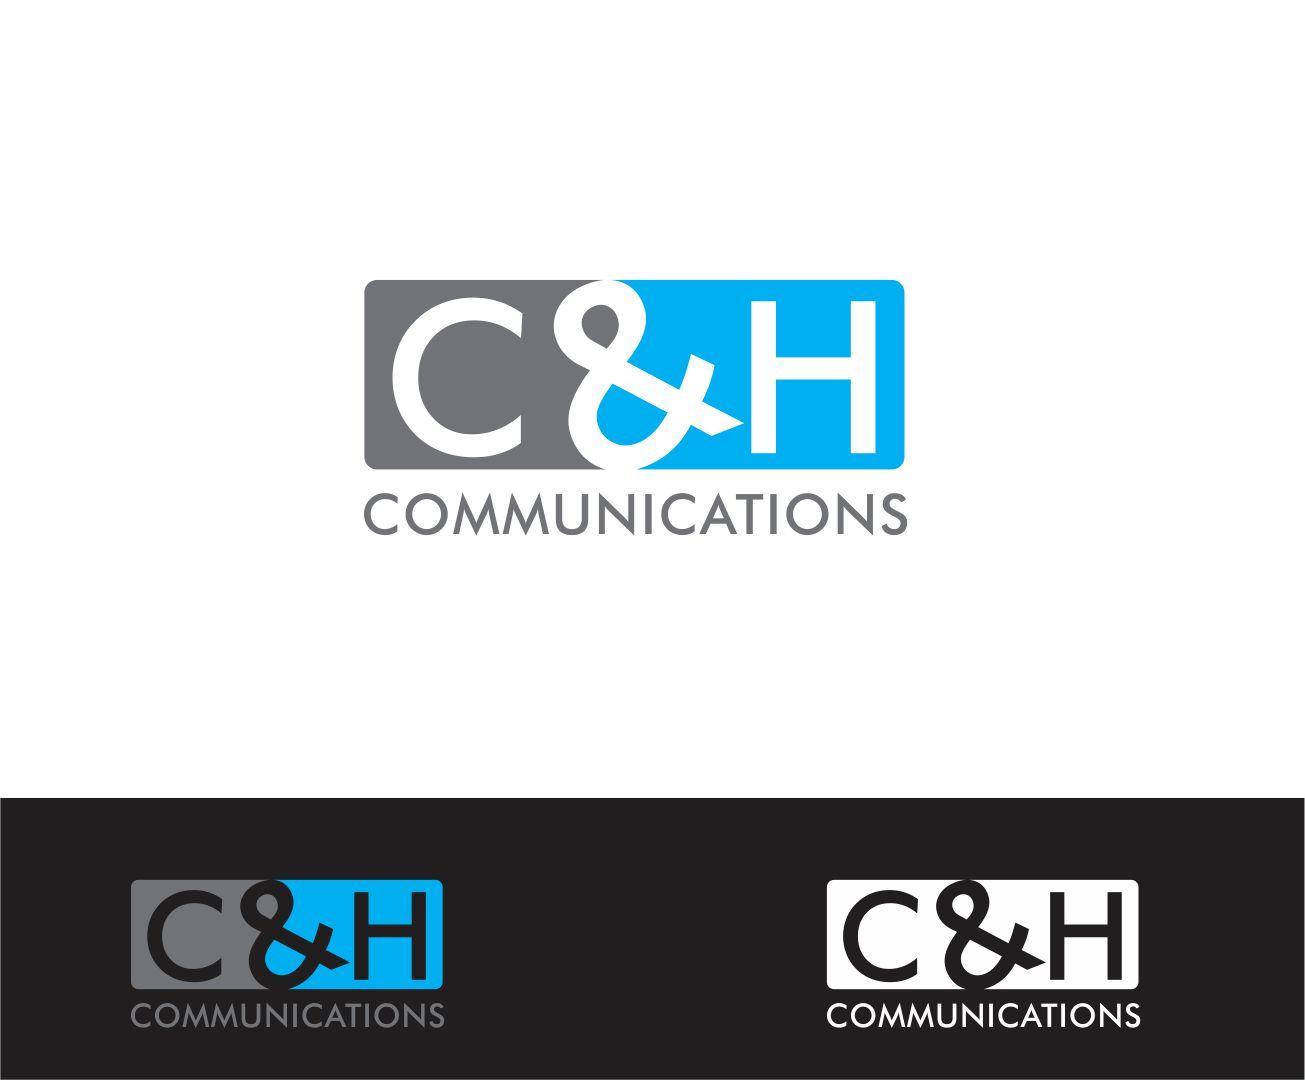 Logo Design by Reivan Ferdinan - Entry No. 77 in the Logo Design Contest Artistic Logo Design for C&H Communications.